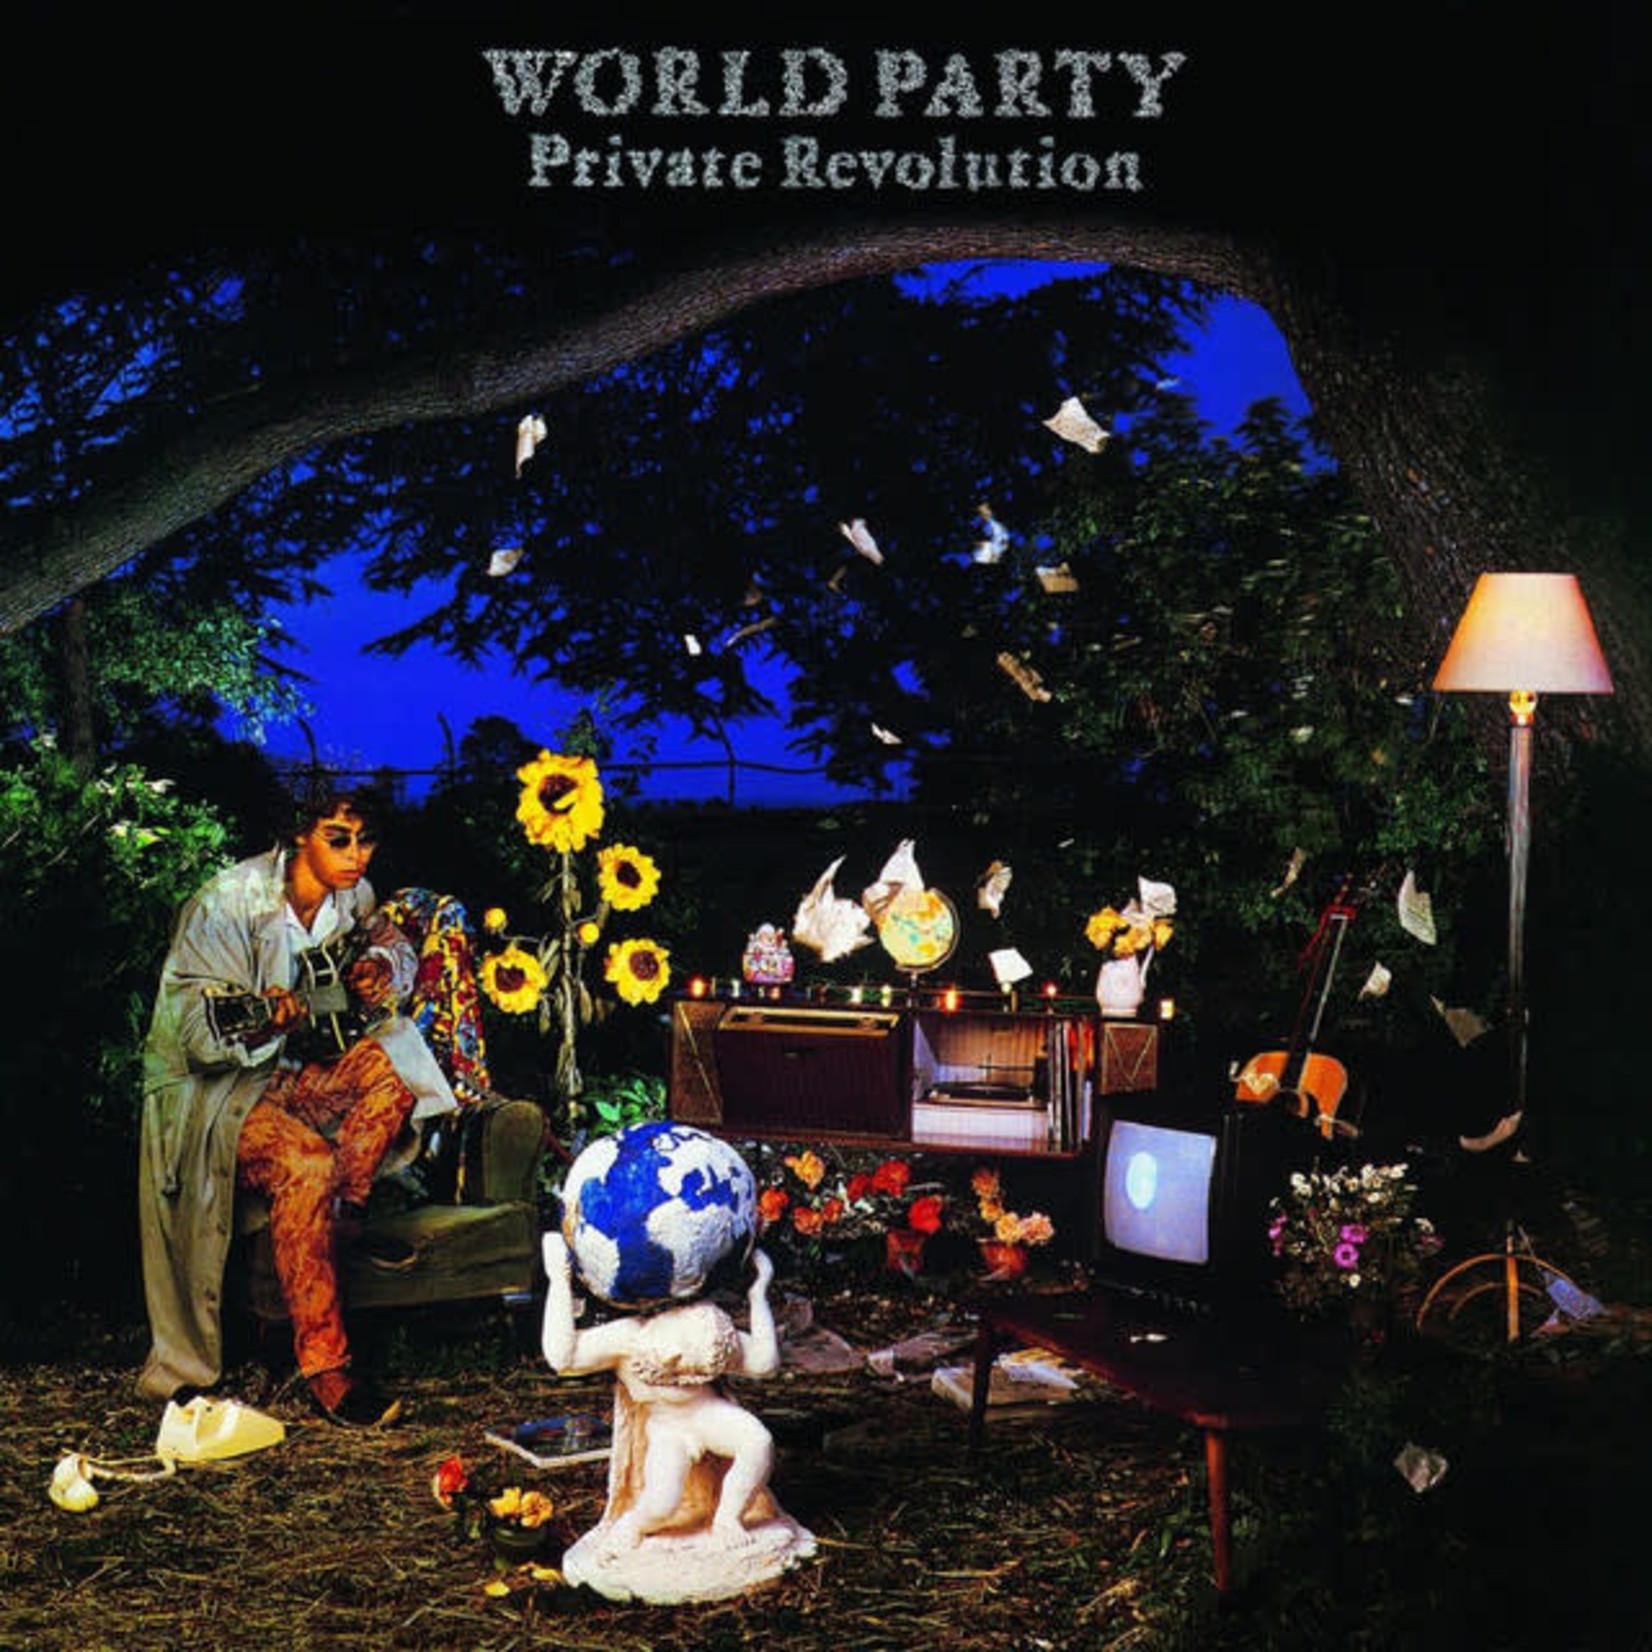 Vinyl World Party - Private Revolution